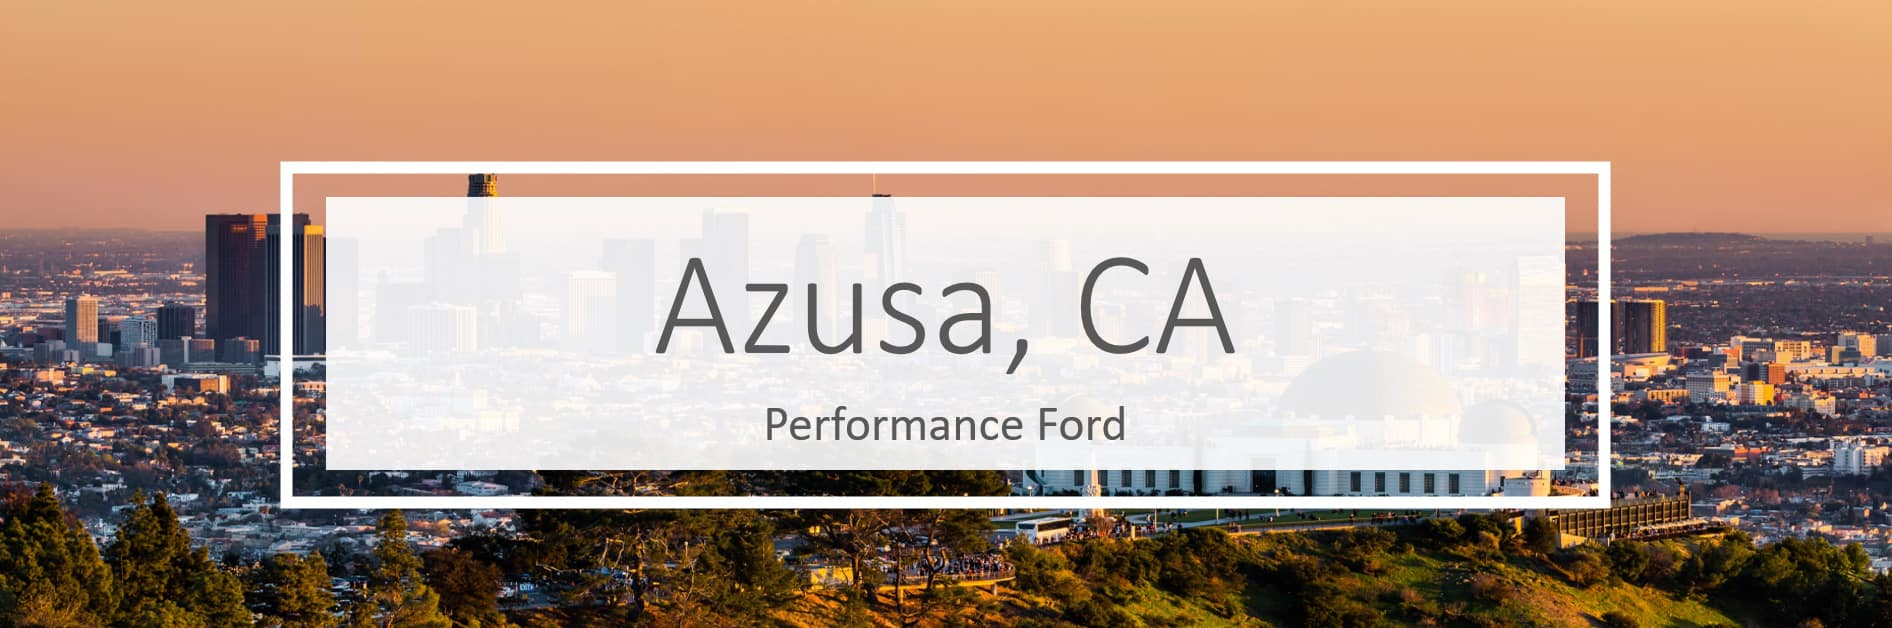 Ford Dealer in Azusa CA